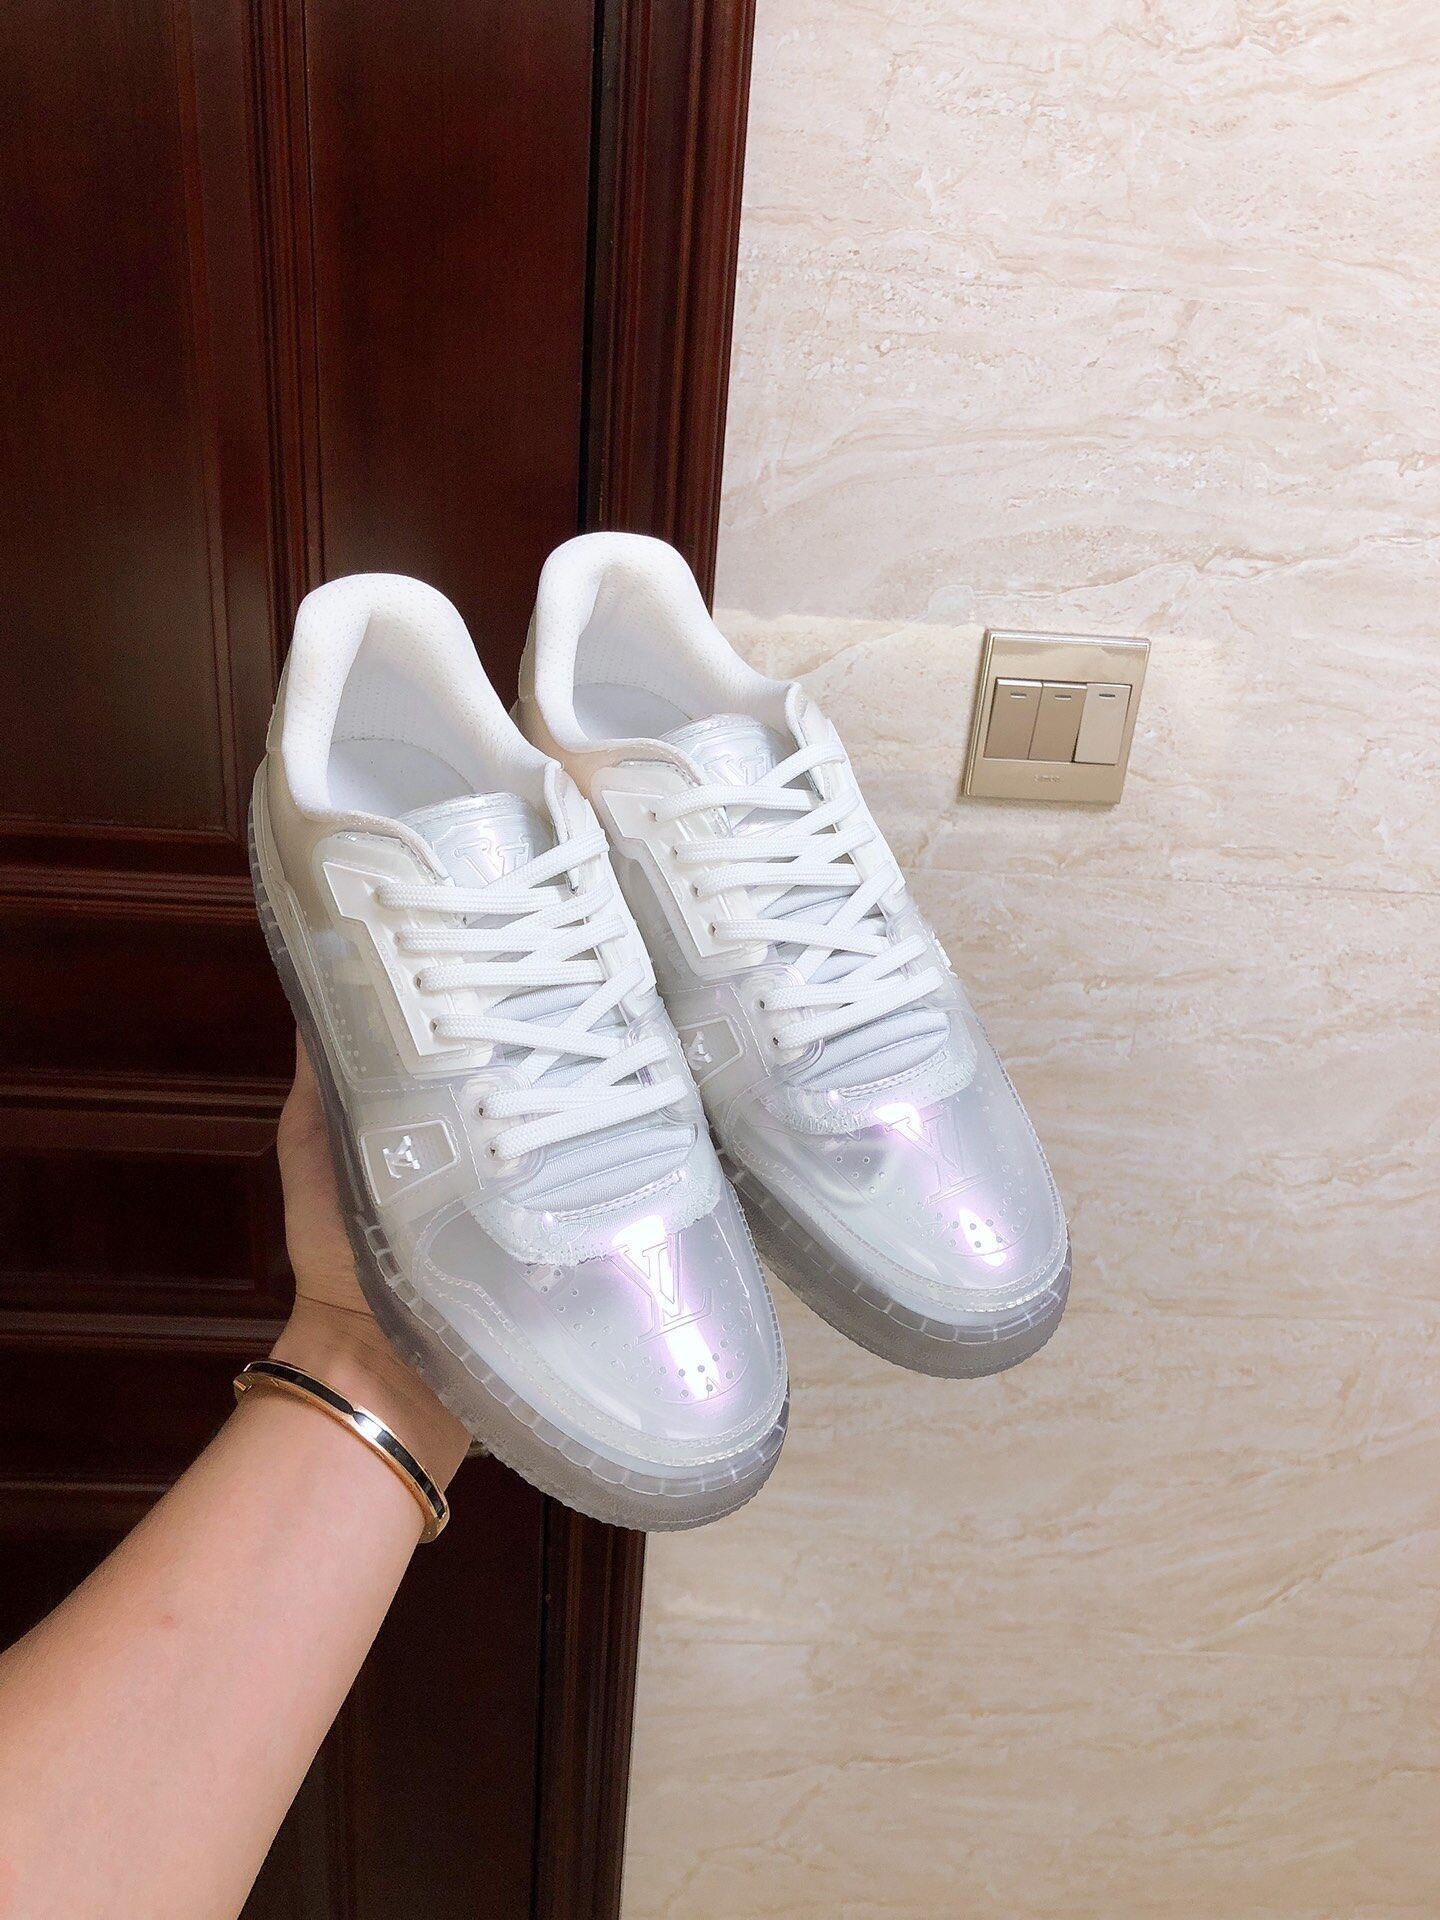 Newest     trainer sneaker    men sneaker    sneaker    shoes 1A5YQY 9